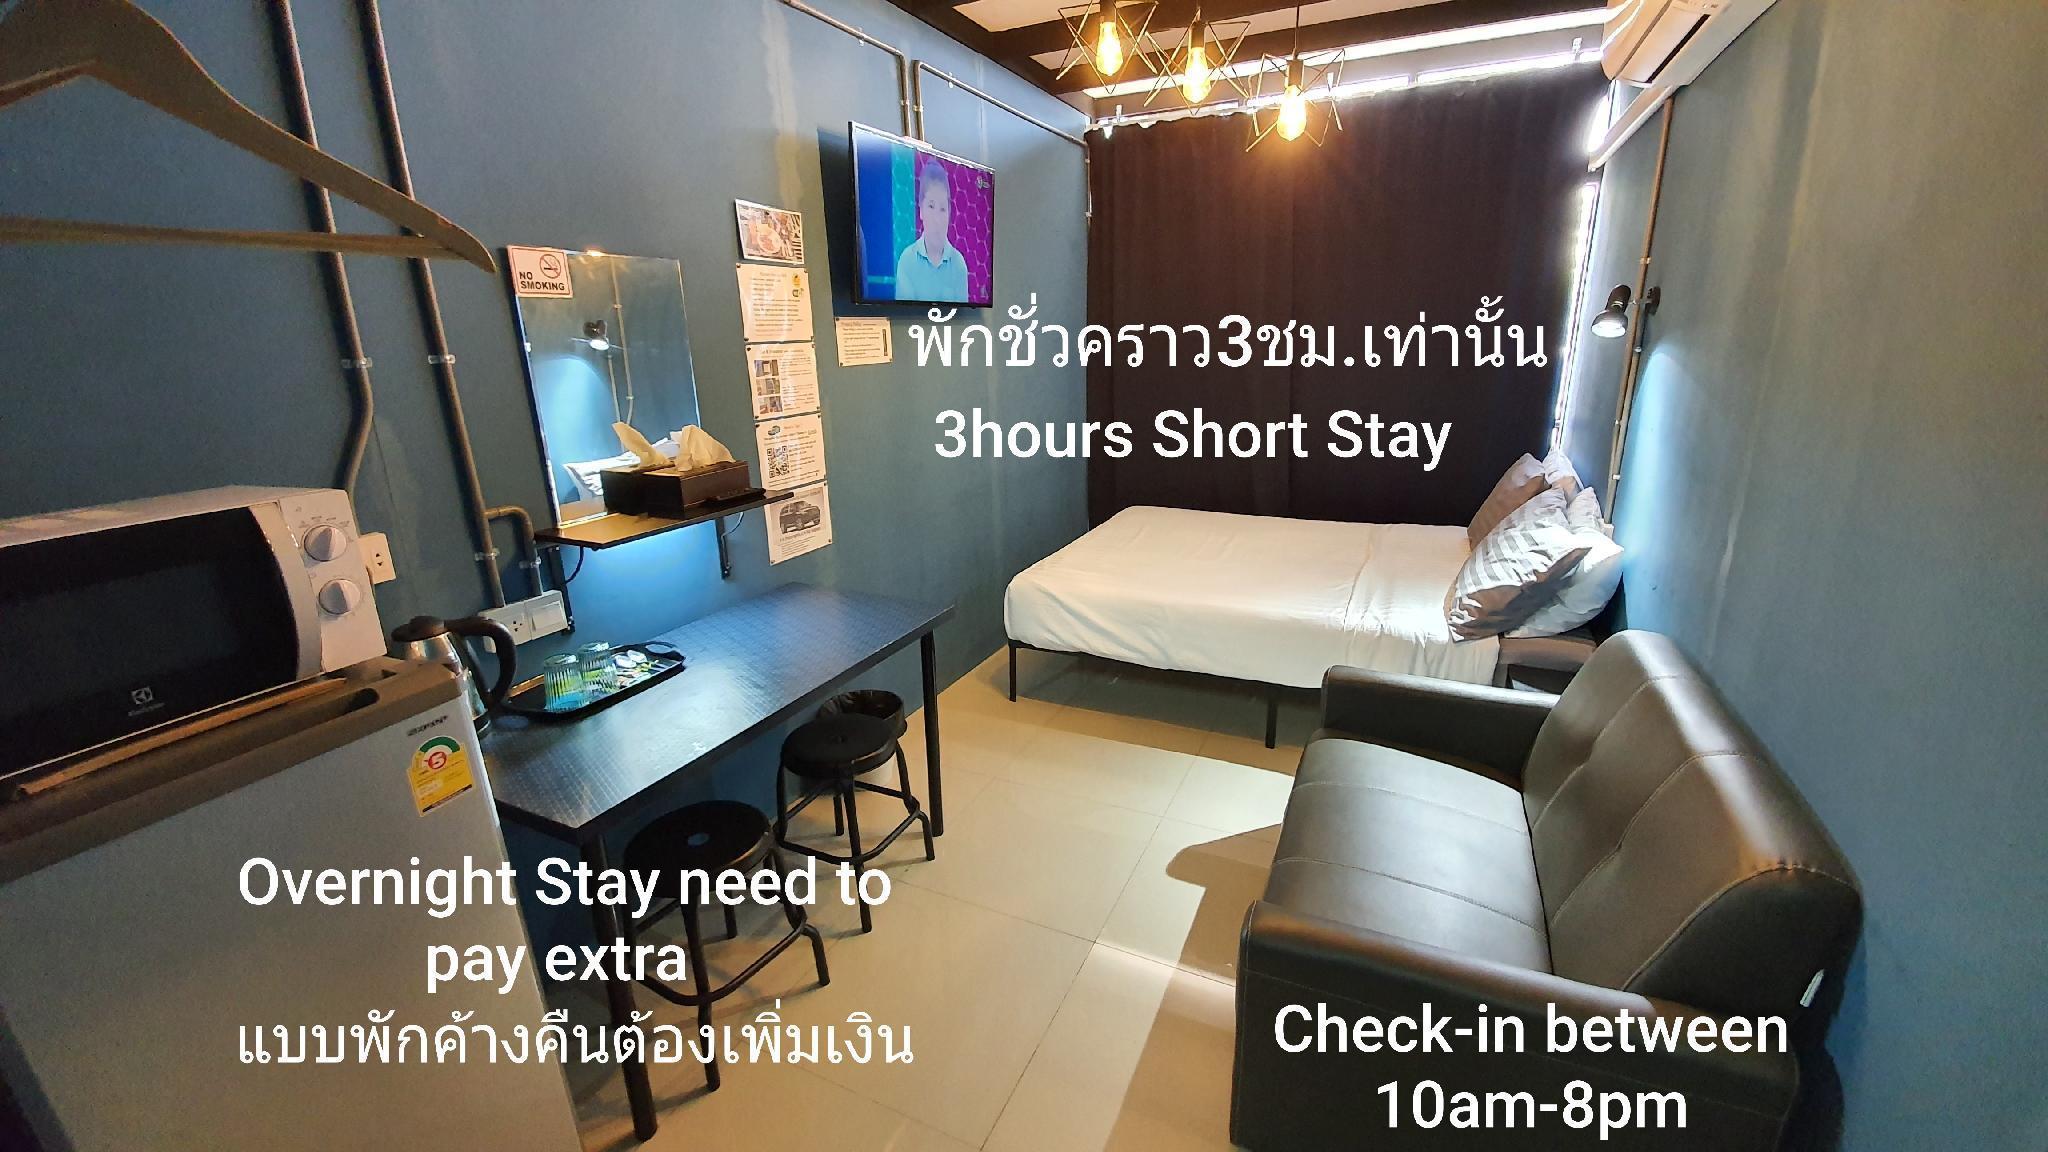 3hours Temporary Short Stay during Between10am-8pm สตูดิโอ บังกะโล 1 ห้องน้ำส่วนตัว ขนาด 18 ตร.ม. – สนามบินนานาชาติดอนเมือง